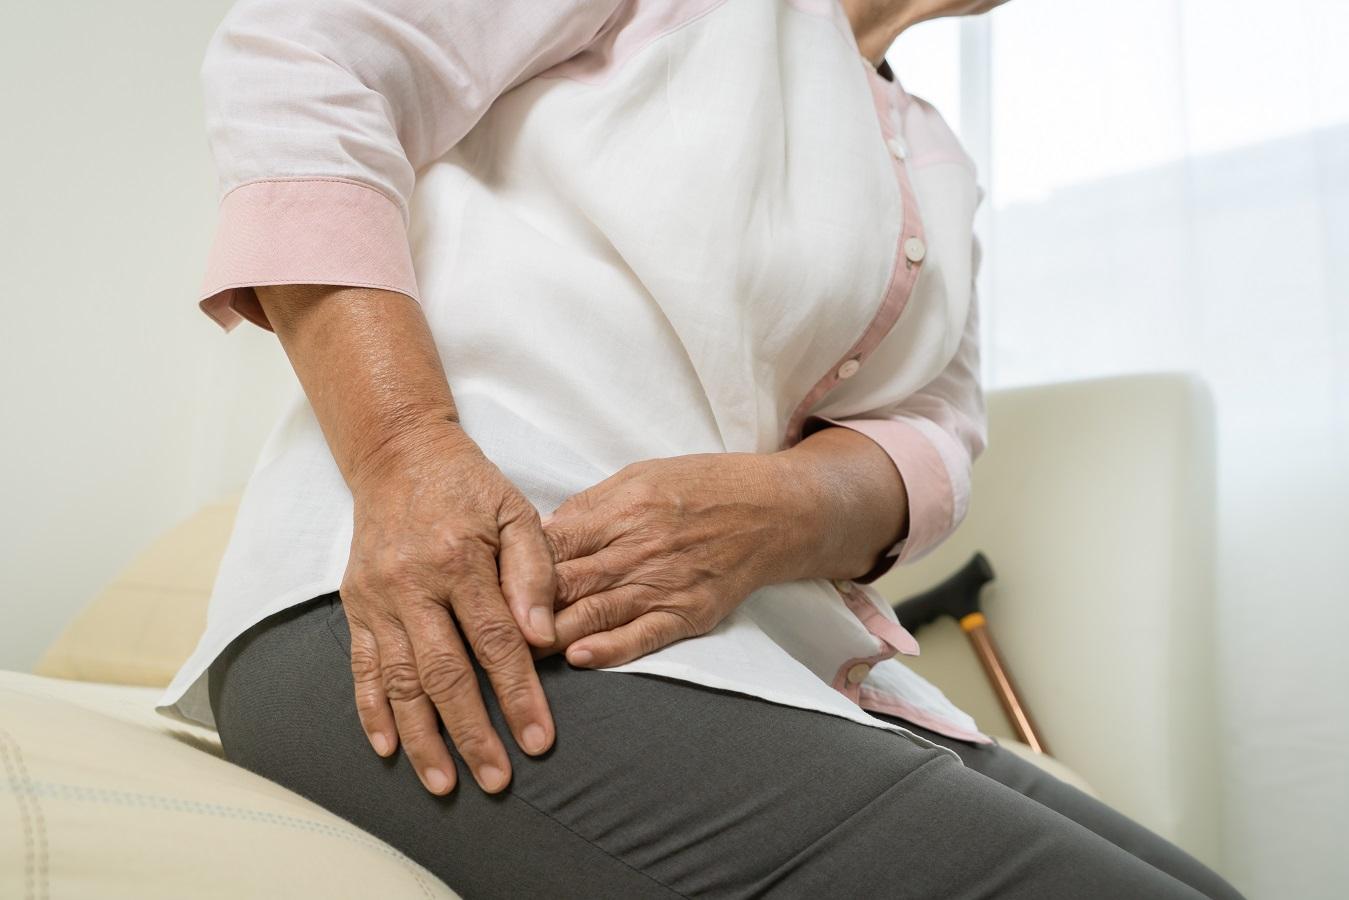 5 Treatment Options for Hip Osteoarthritis